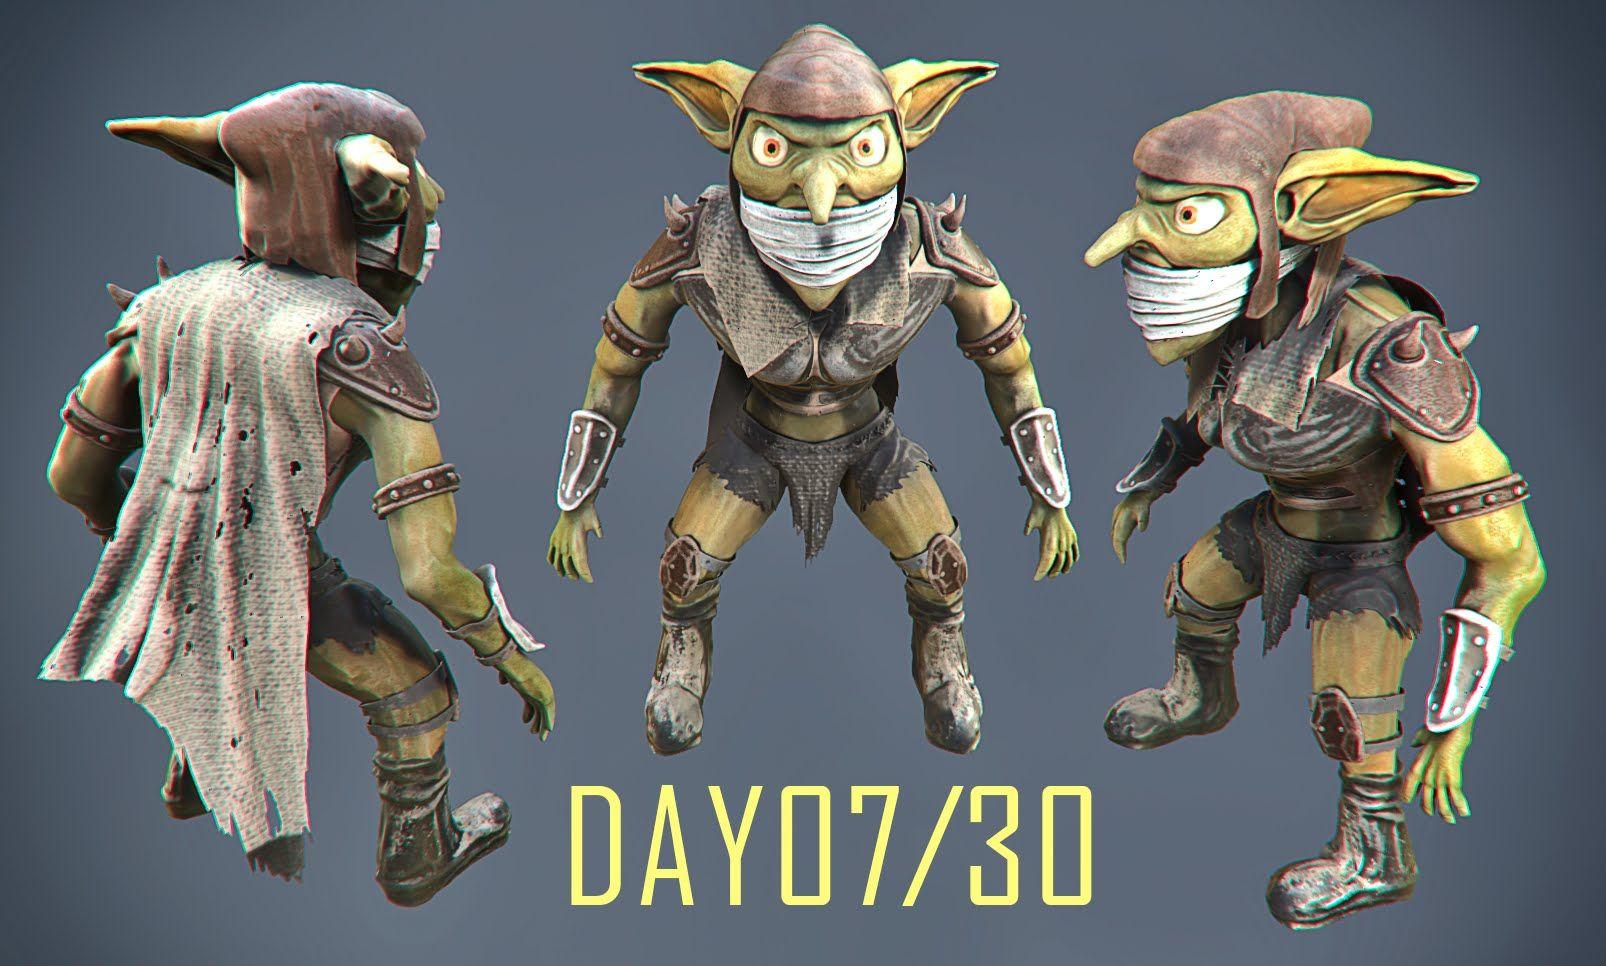 DAY07 / 30 Day 3D Sculpt Challenge - 3D-Coat | 3DCoat | 3d coat